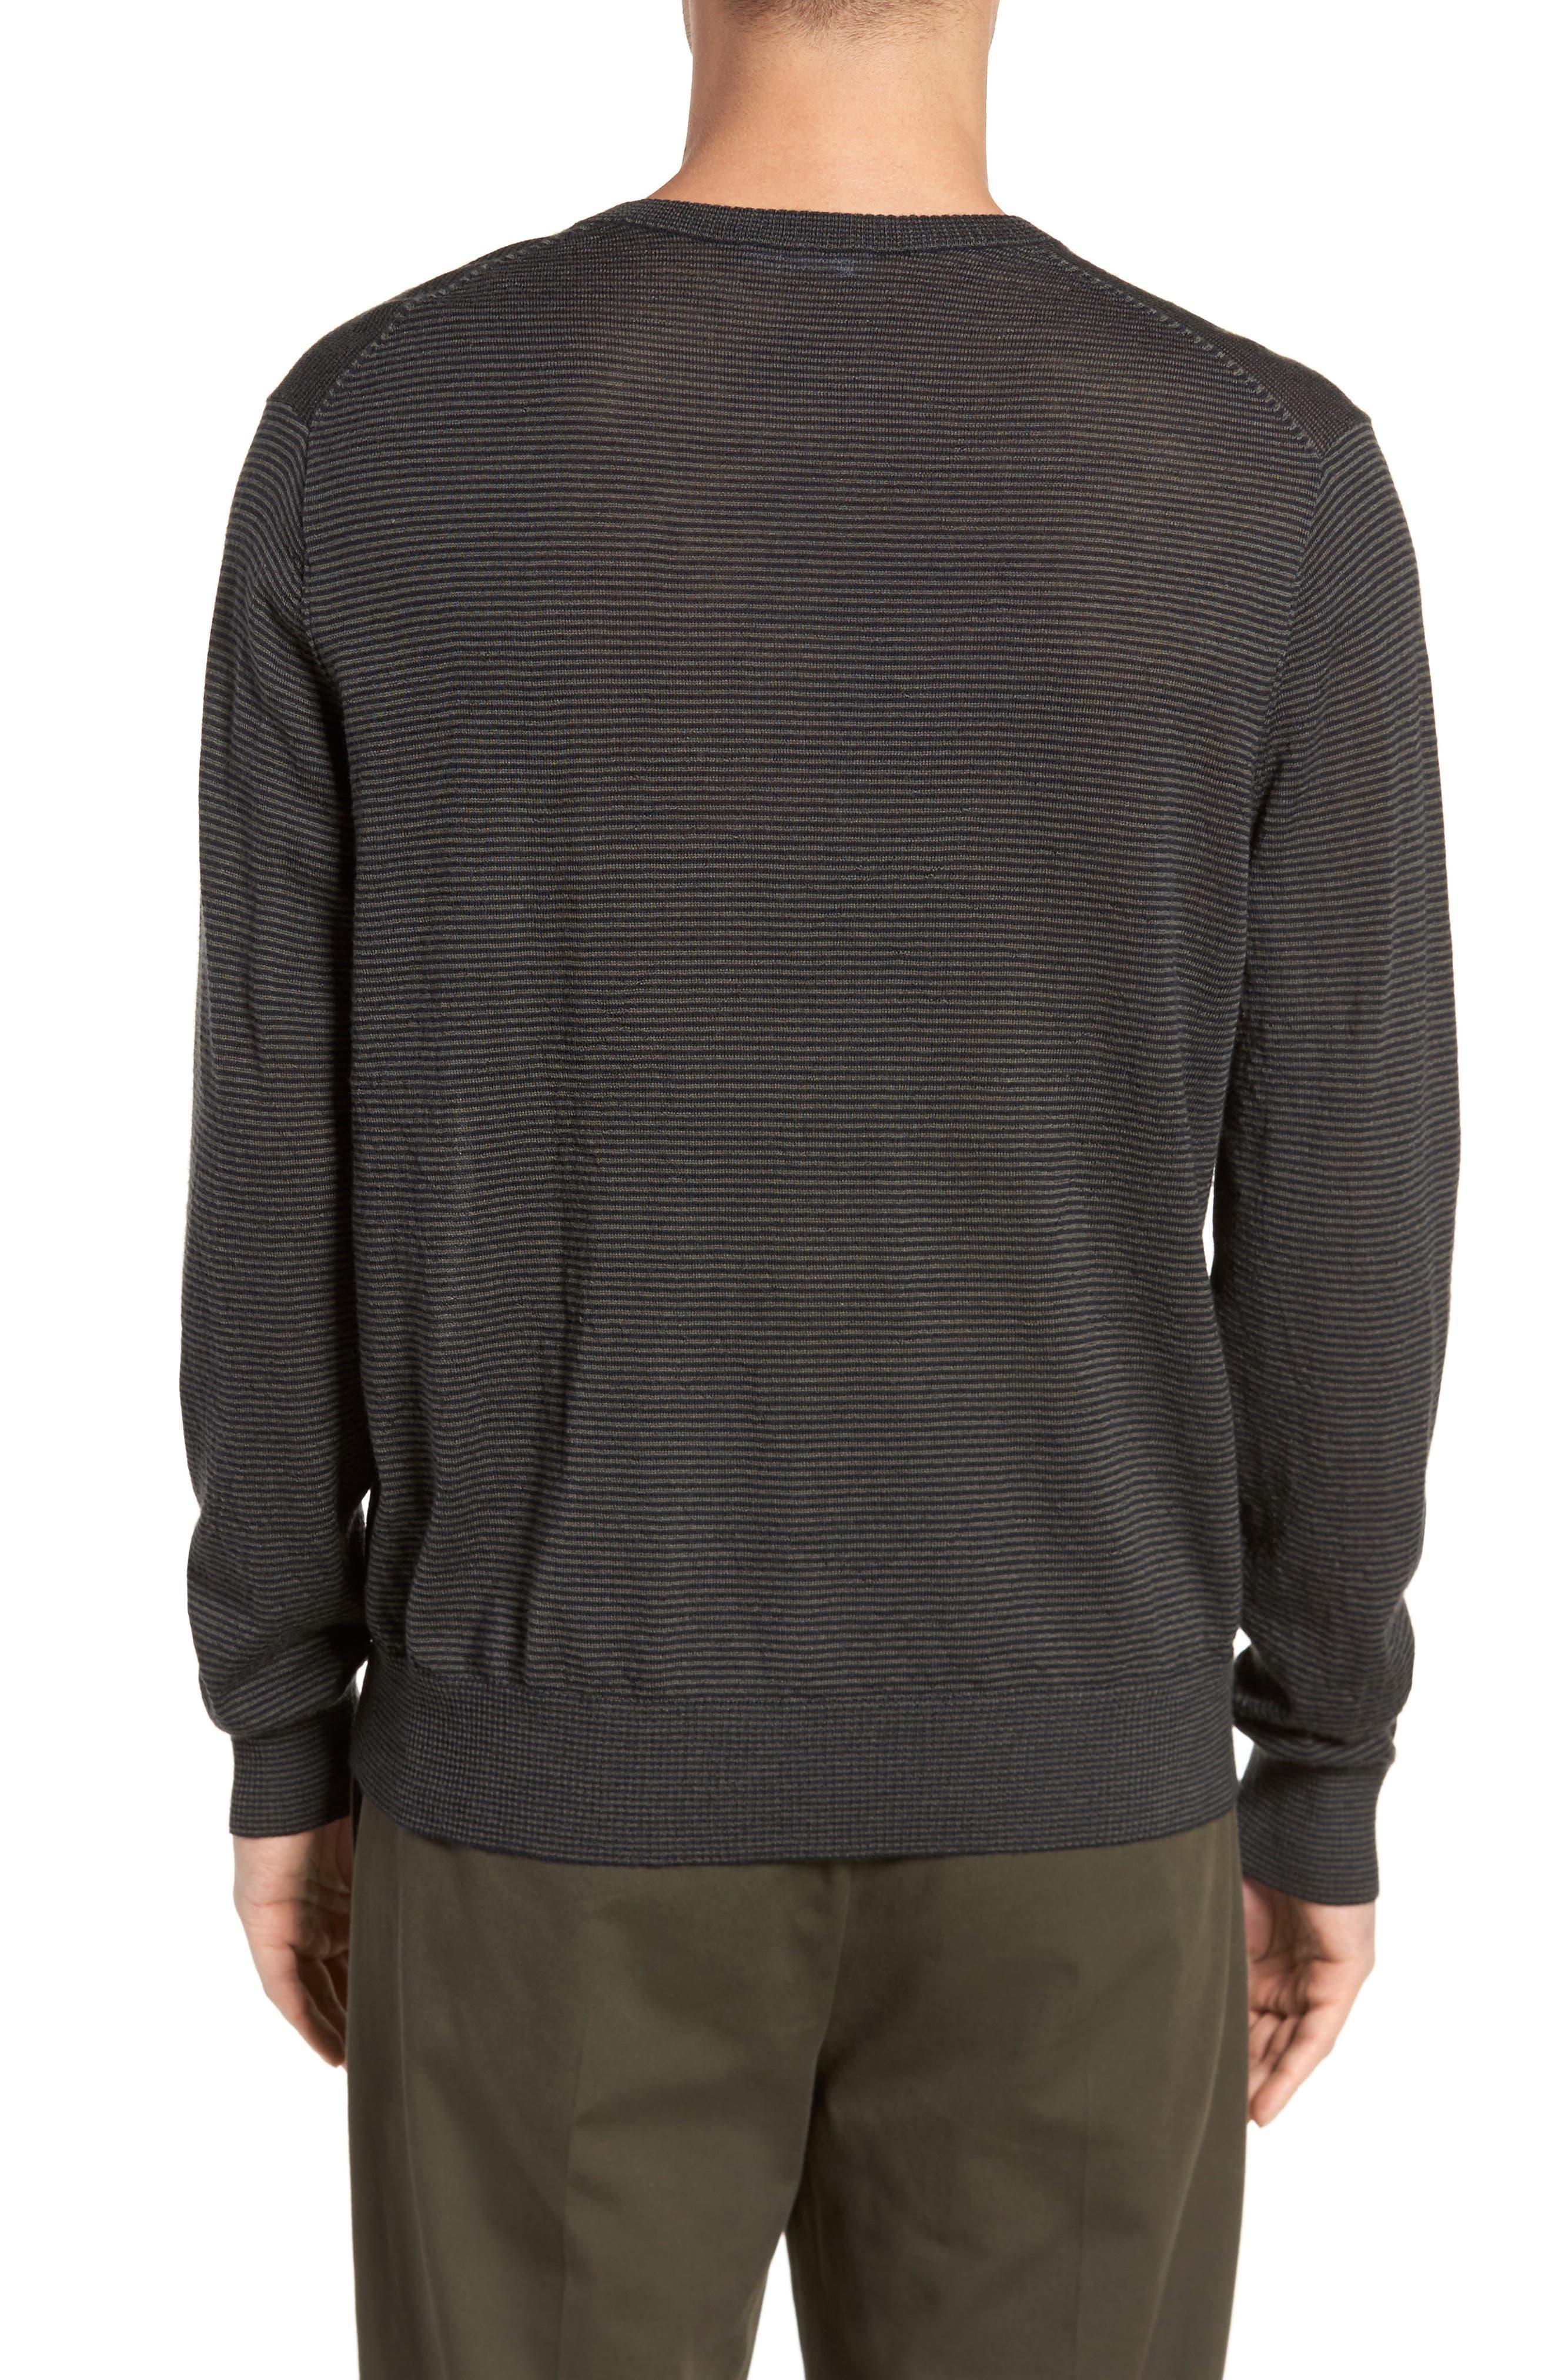 Regular Fit Pinstripe Wool Sweater,                             Alternate thumbnail 2, color,                             New Coastal/ H Charcoal